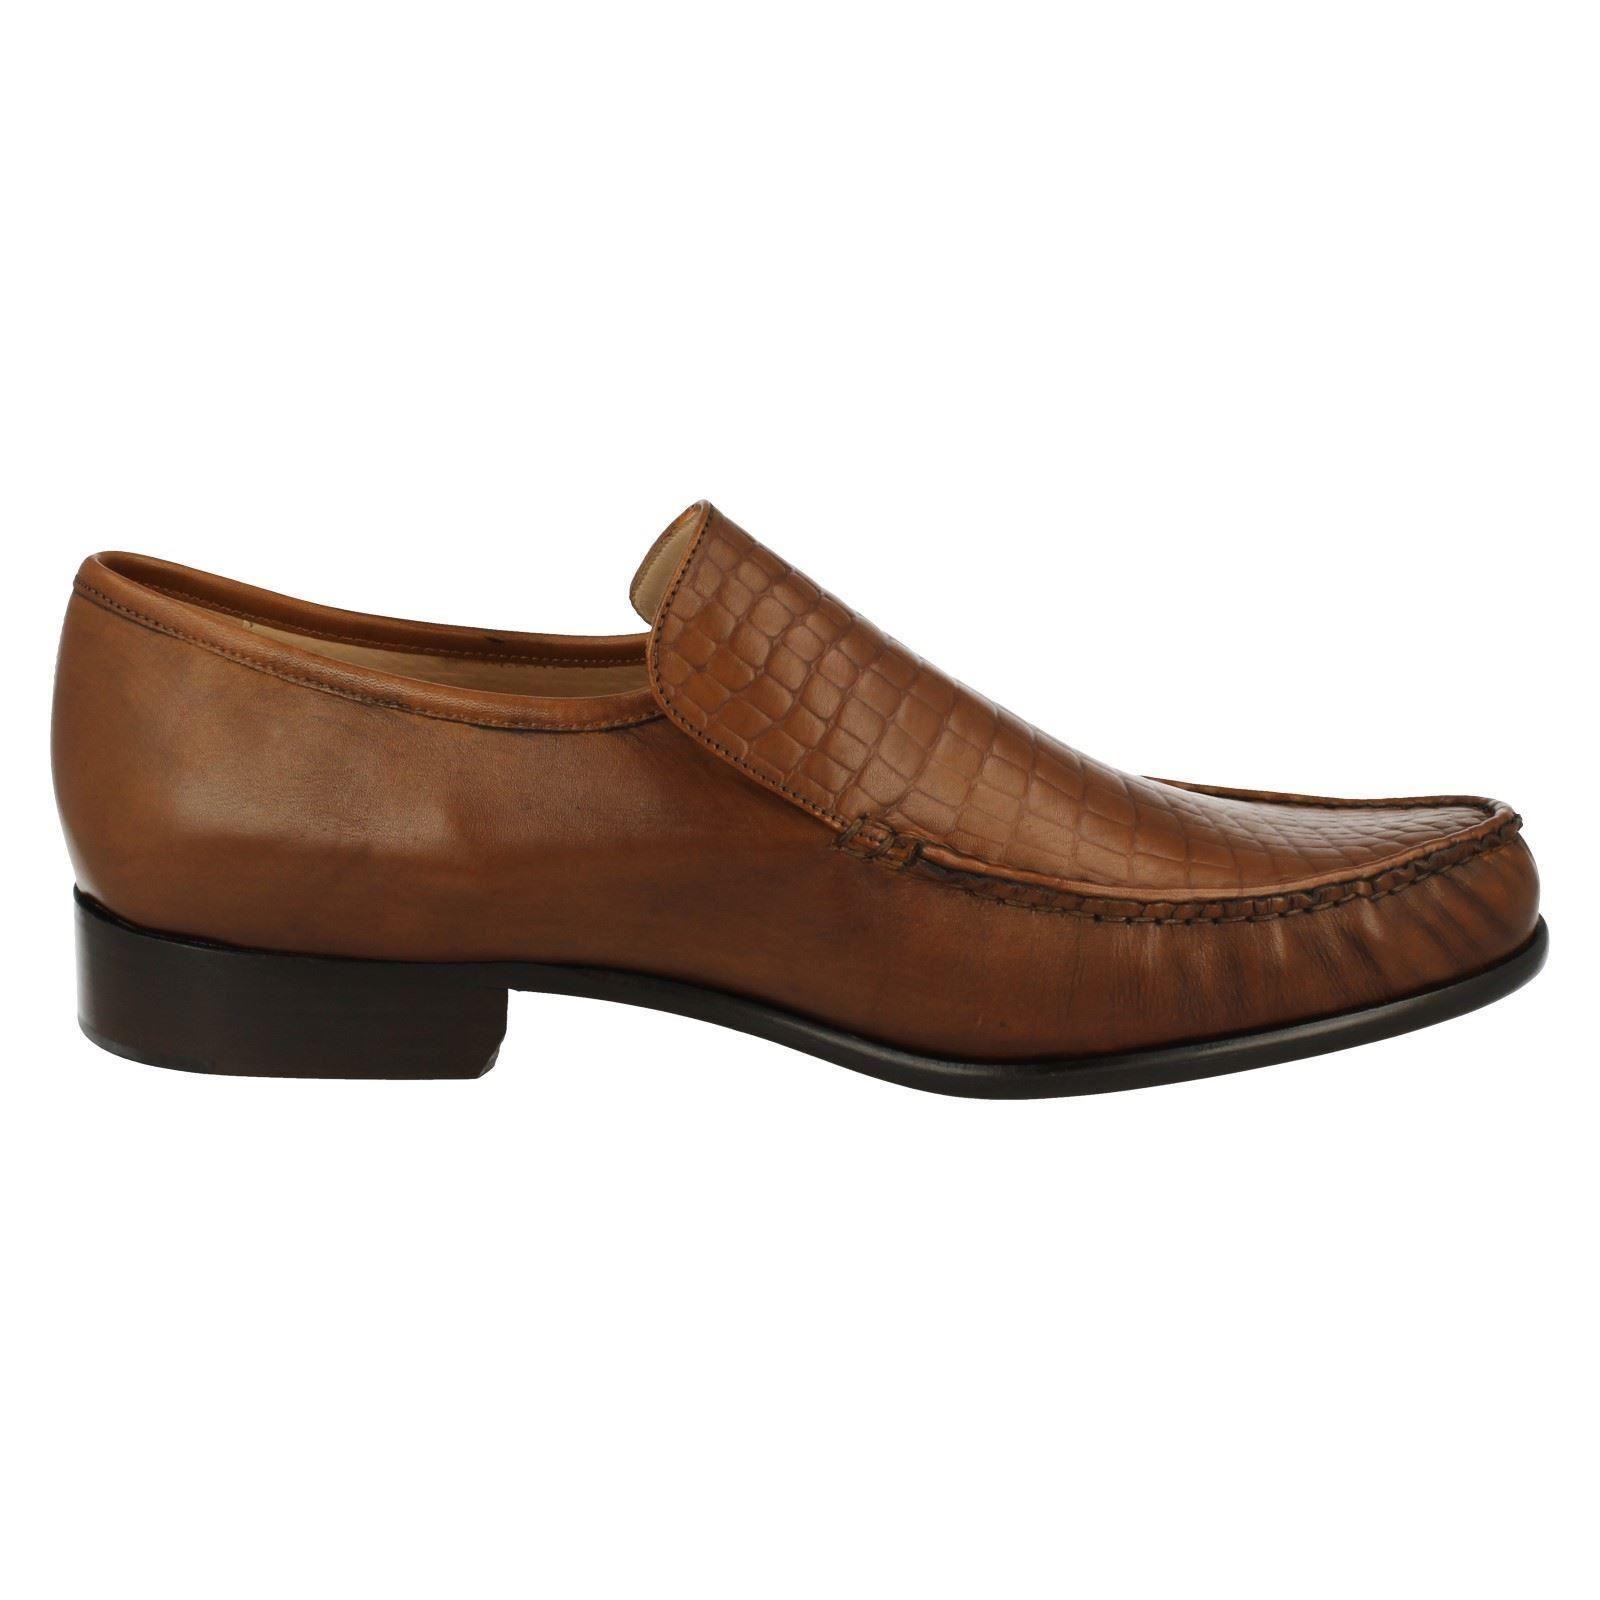 Scarpe Scarpe Scarpe casual da uomo  uomos Grenson FeatherMaster MONTANA brown leather slipon 53669a